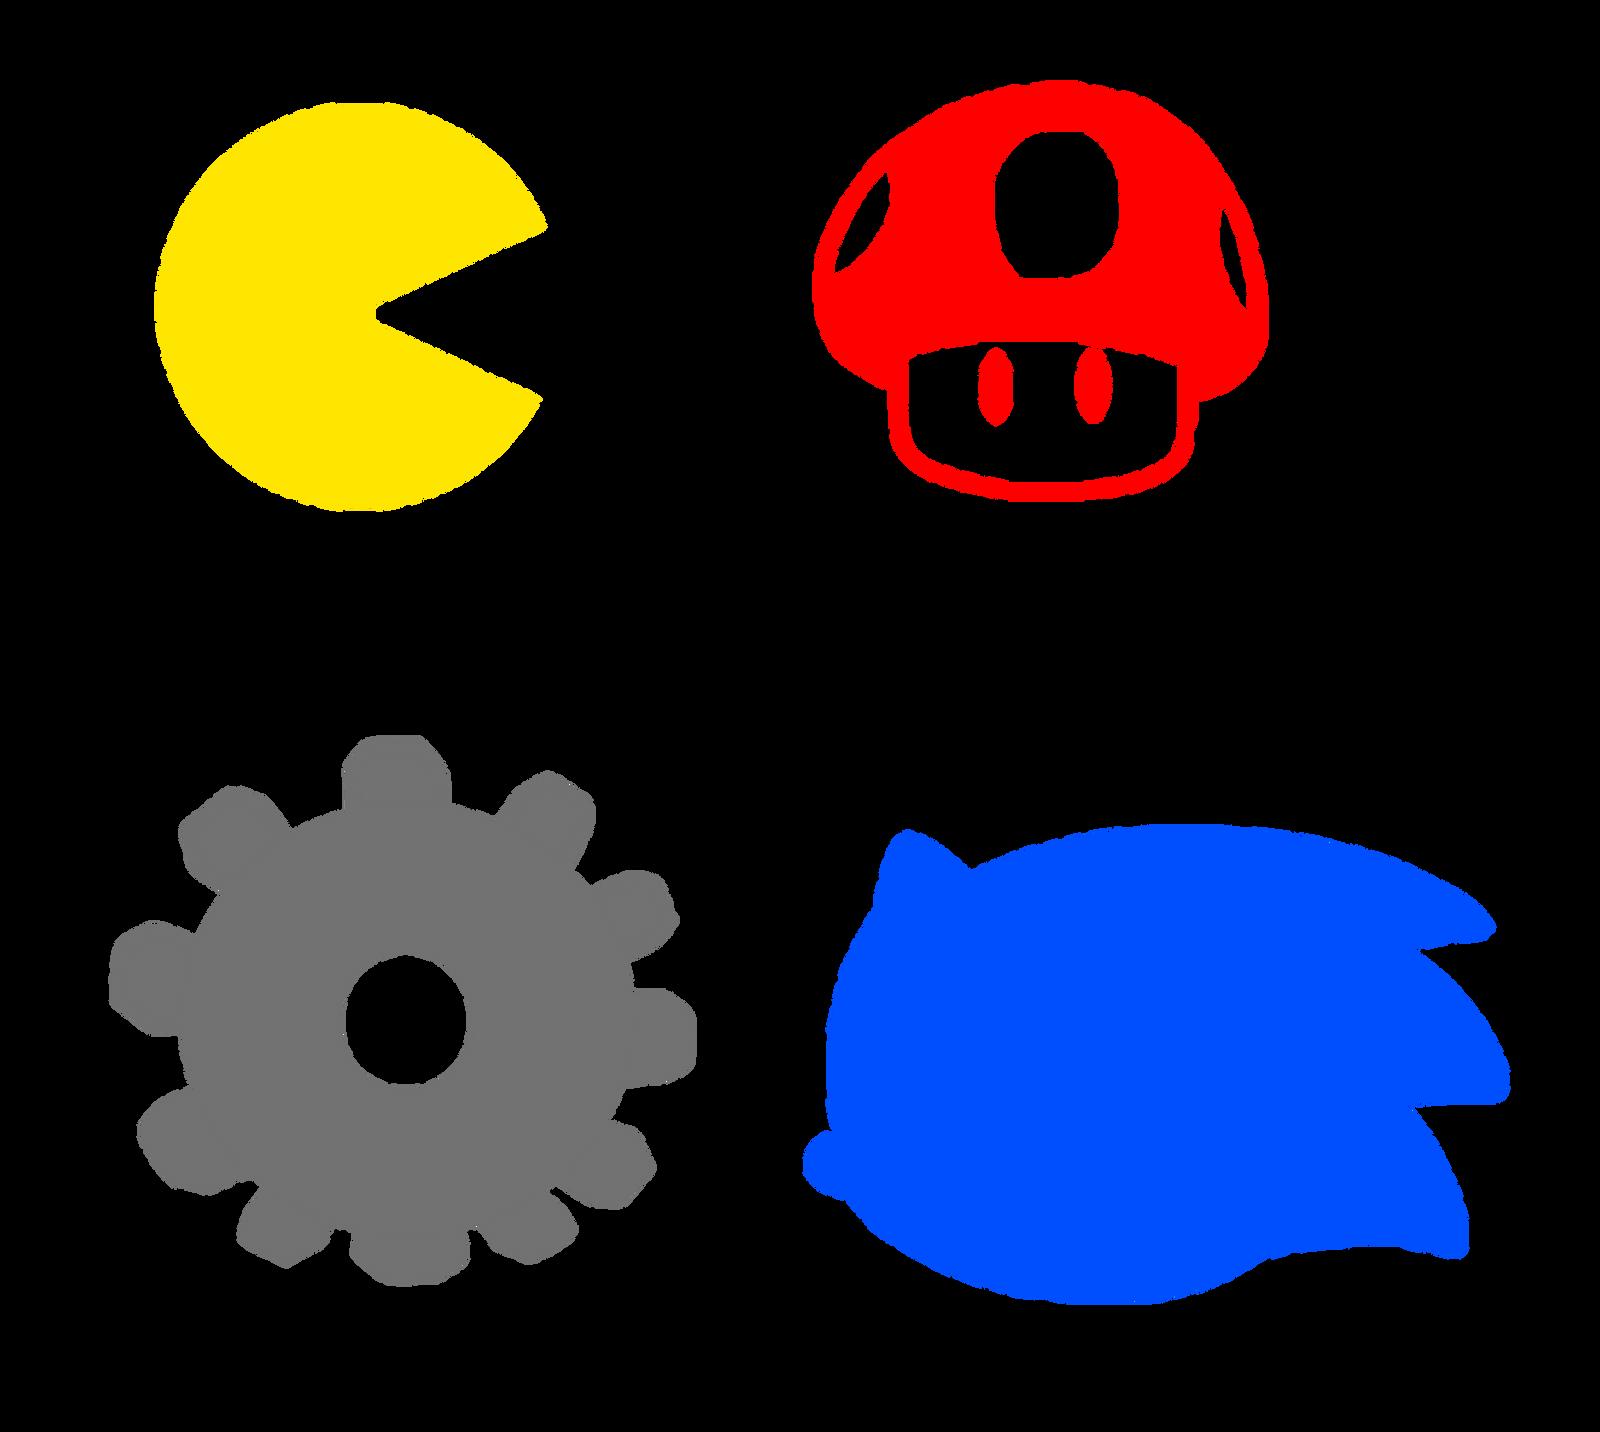 Cool Video Game Symbols | www.pixshark.com - Images ...